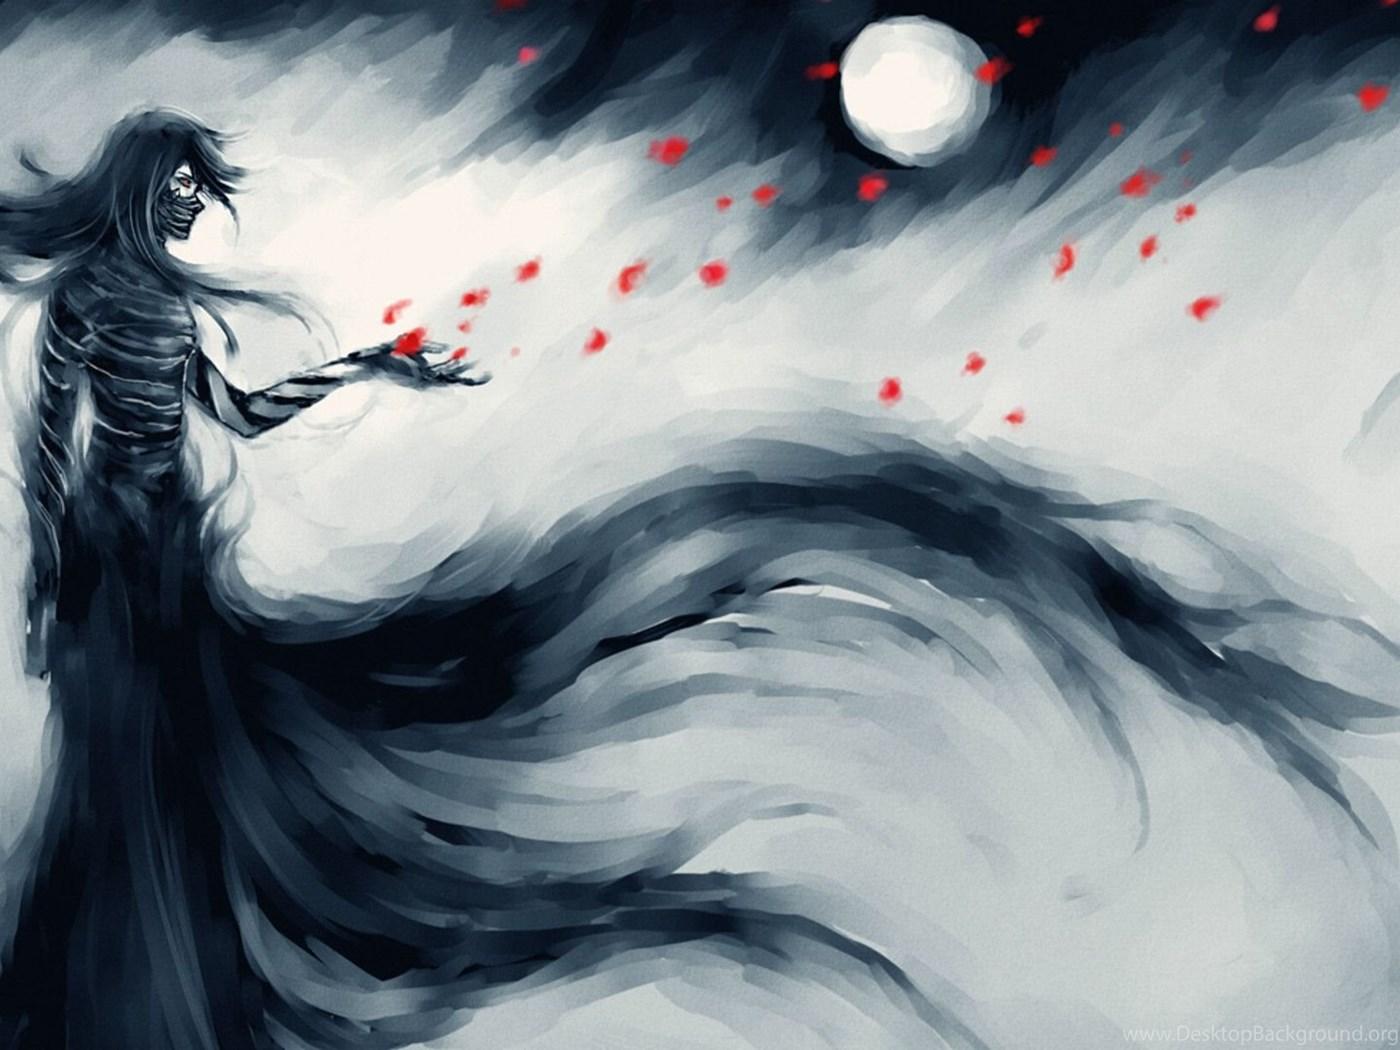 Bleach Anime Backgrounds 7552 HD Wallpapers Site Desktop ...